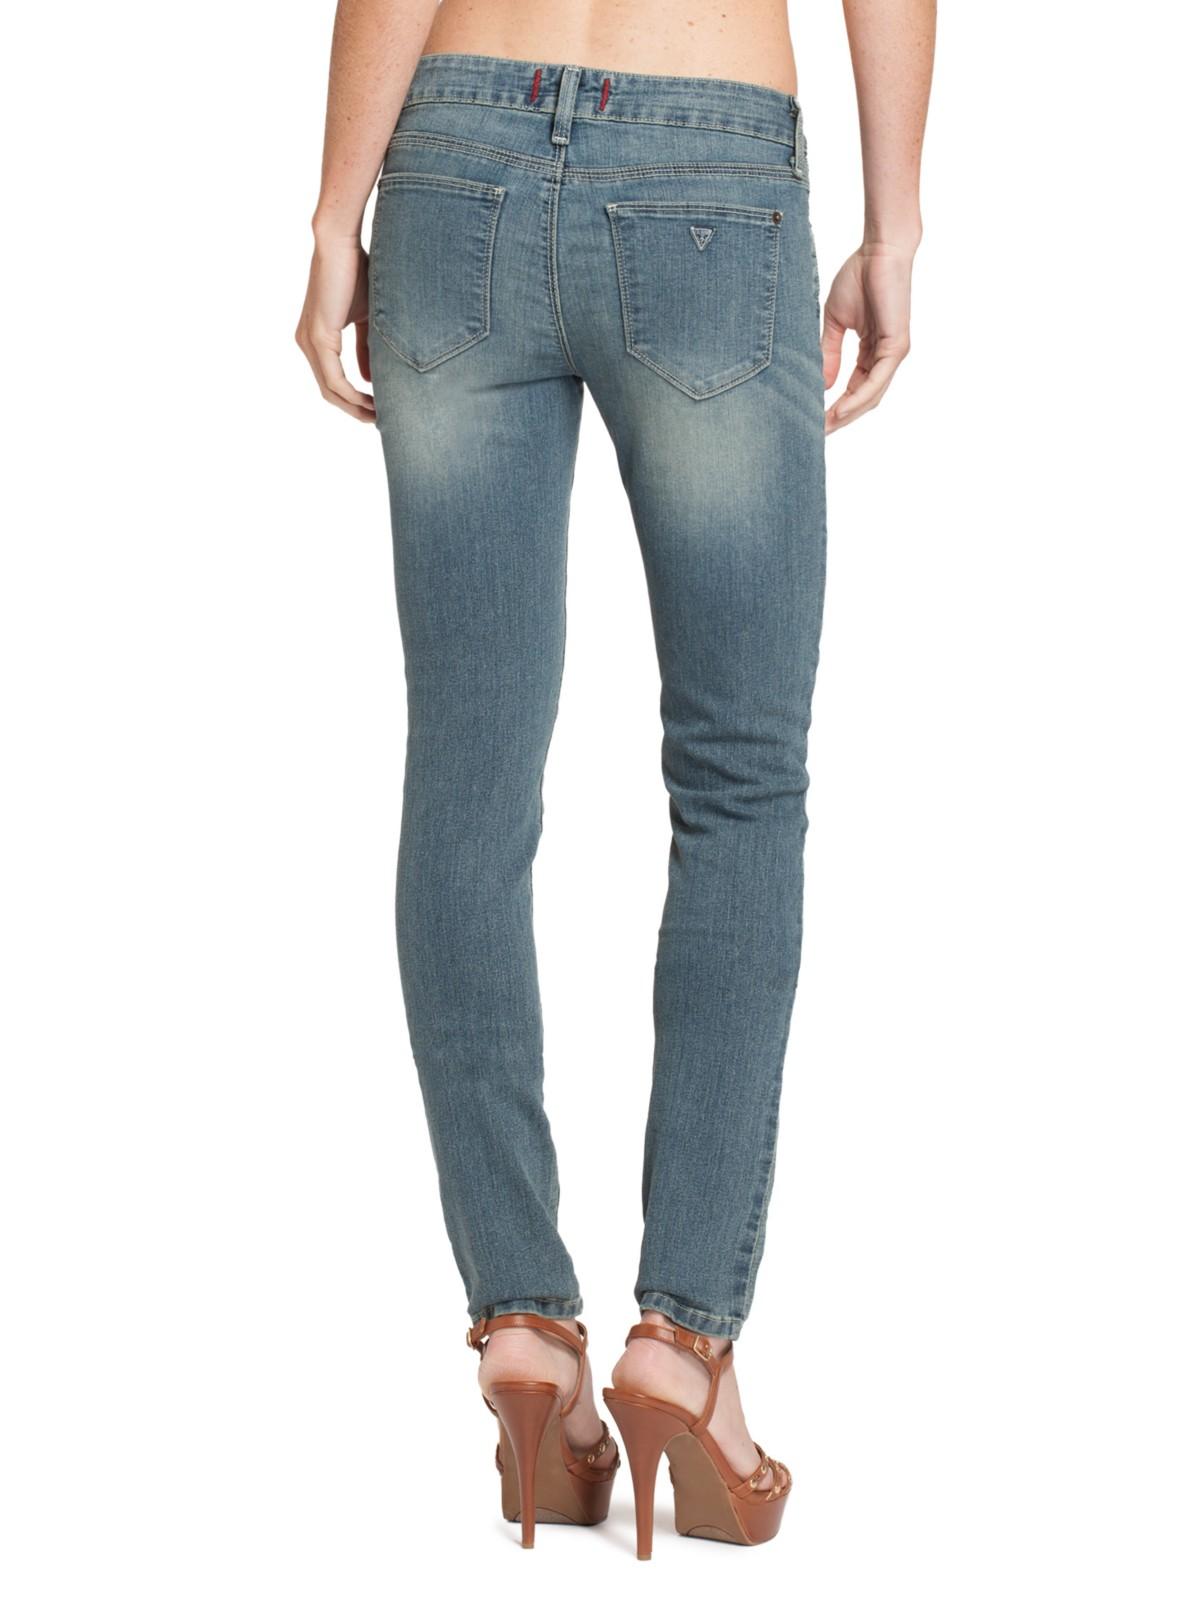 Guess women's sienna curvy skinny jeans